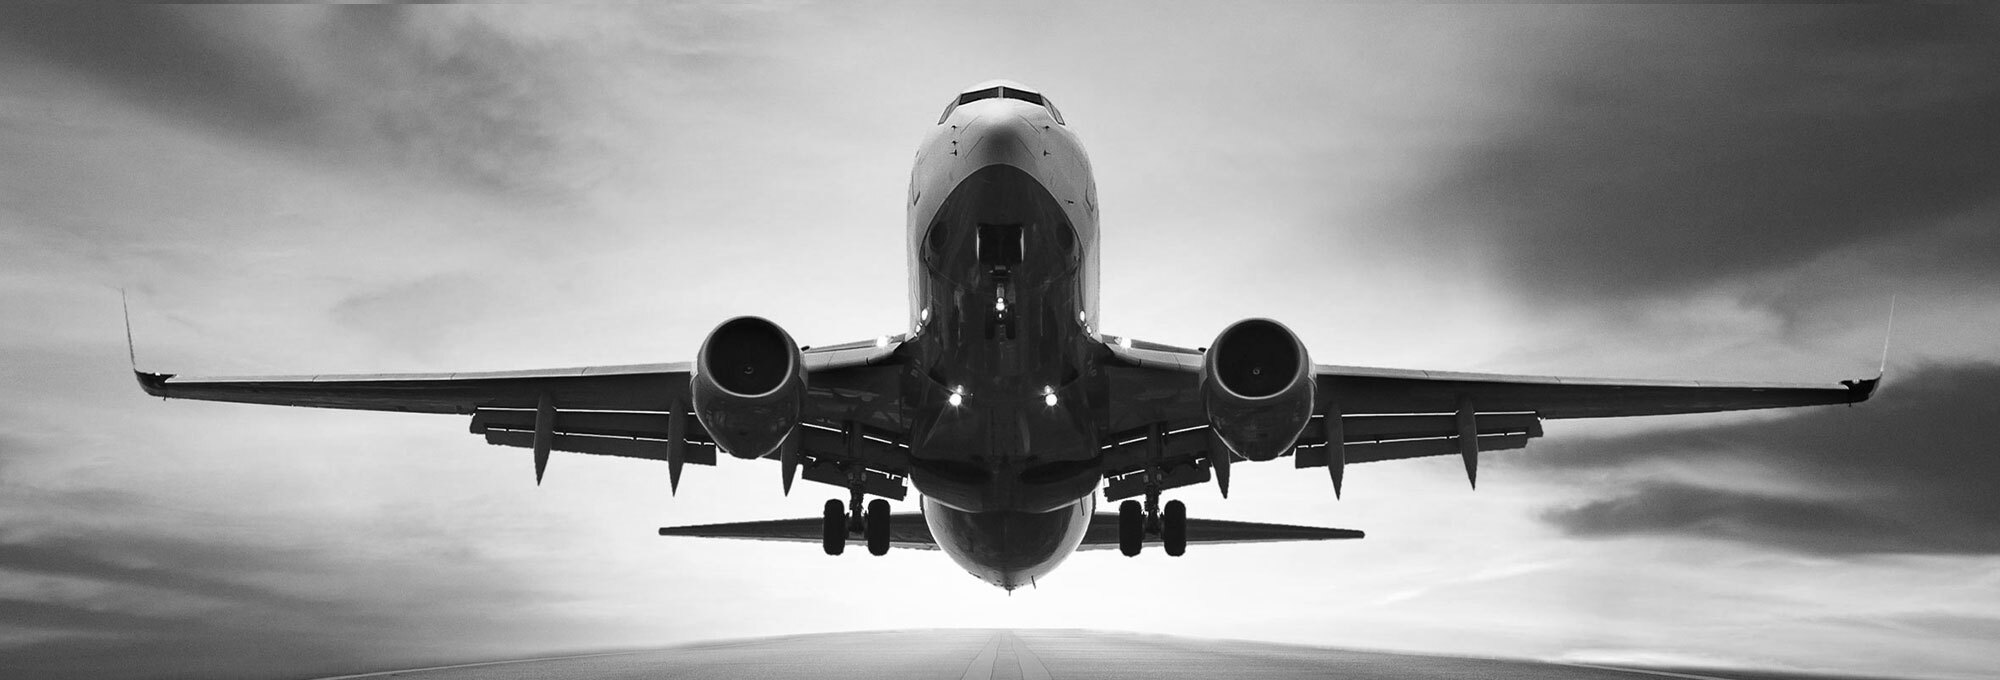 TLC airplane.png